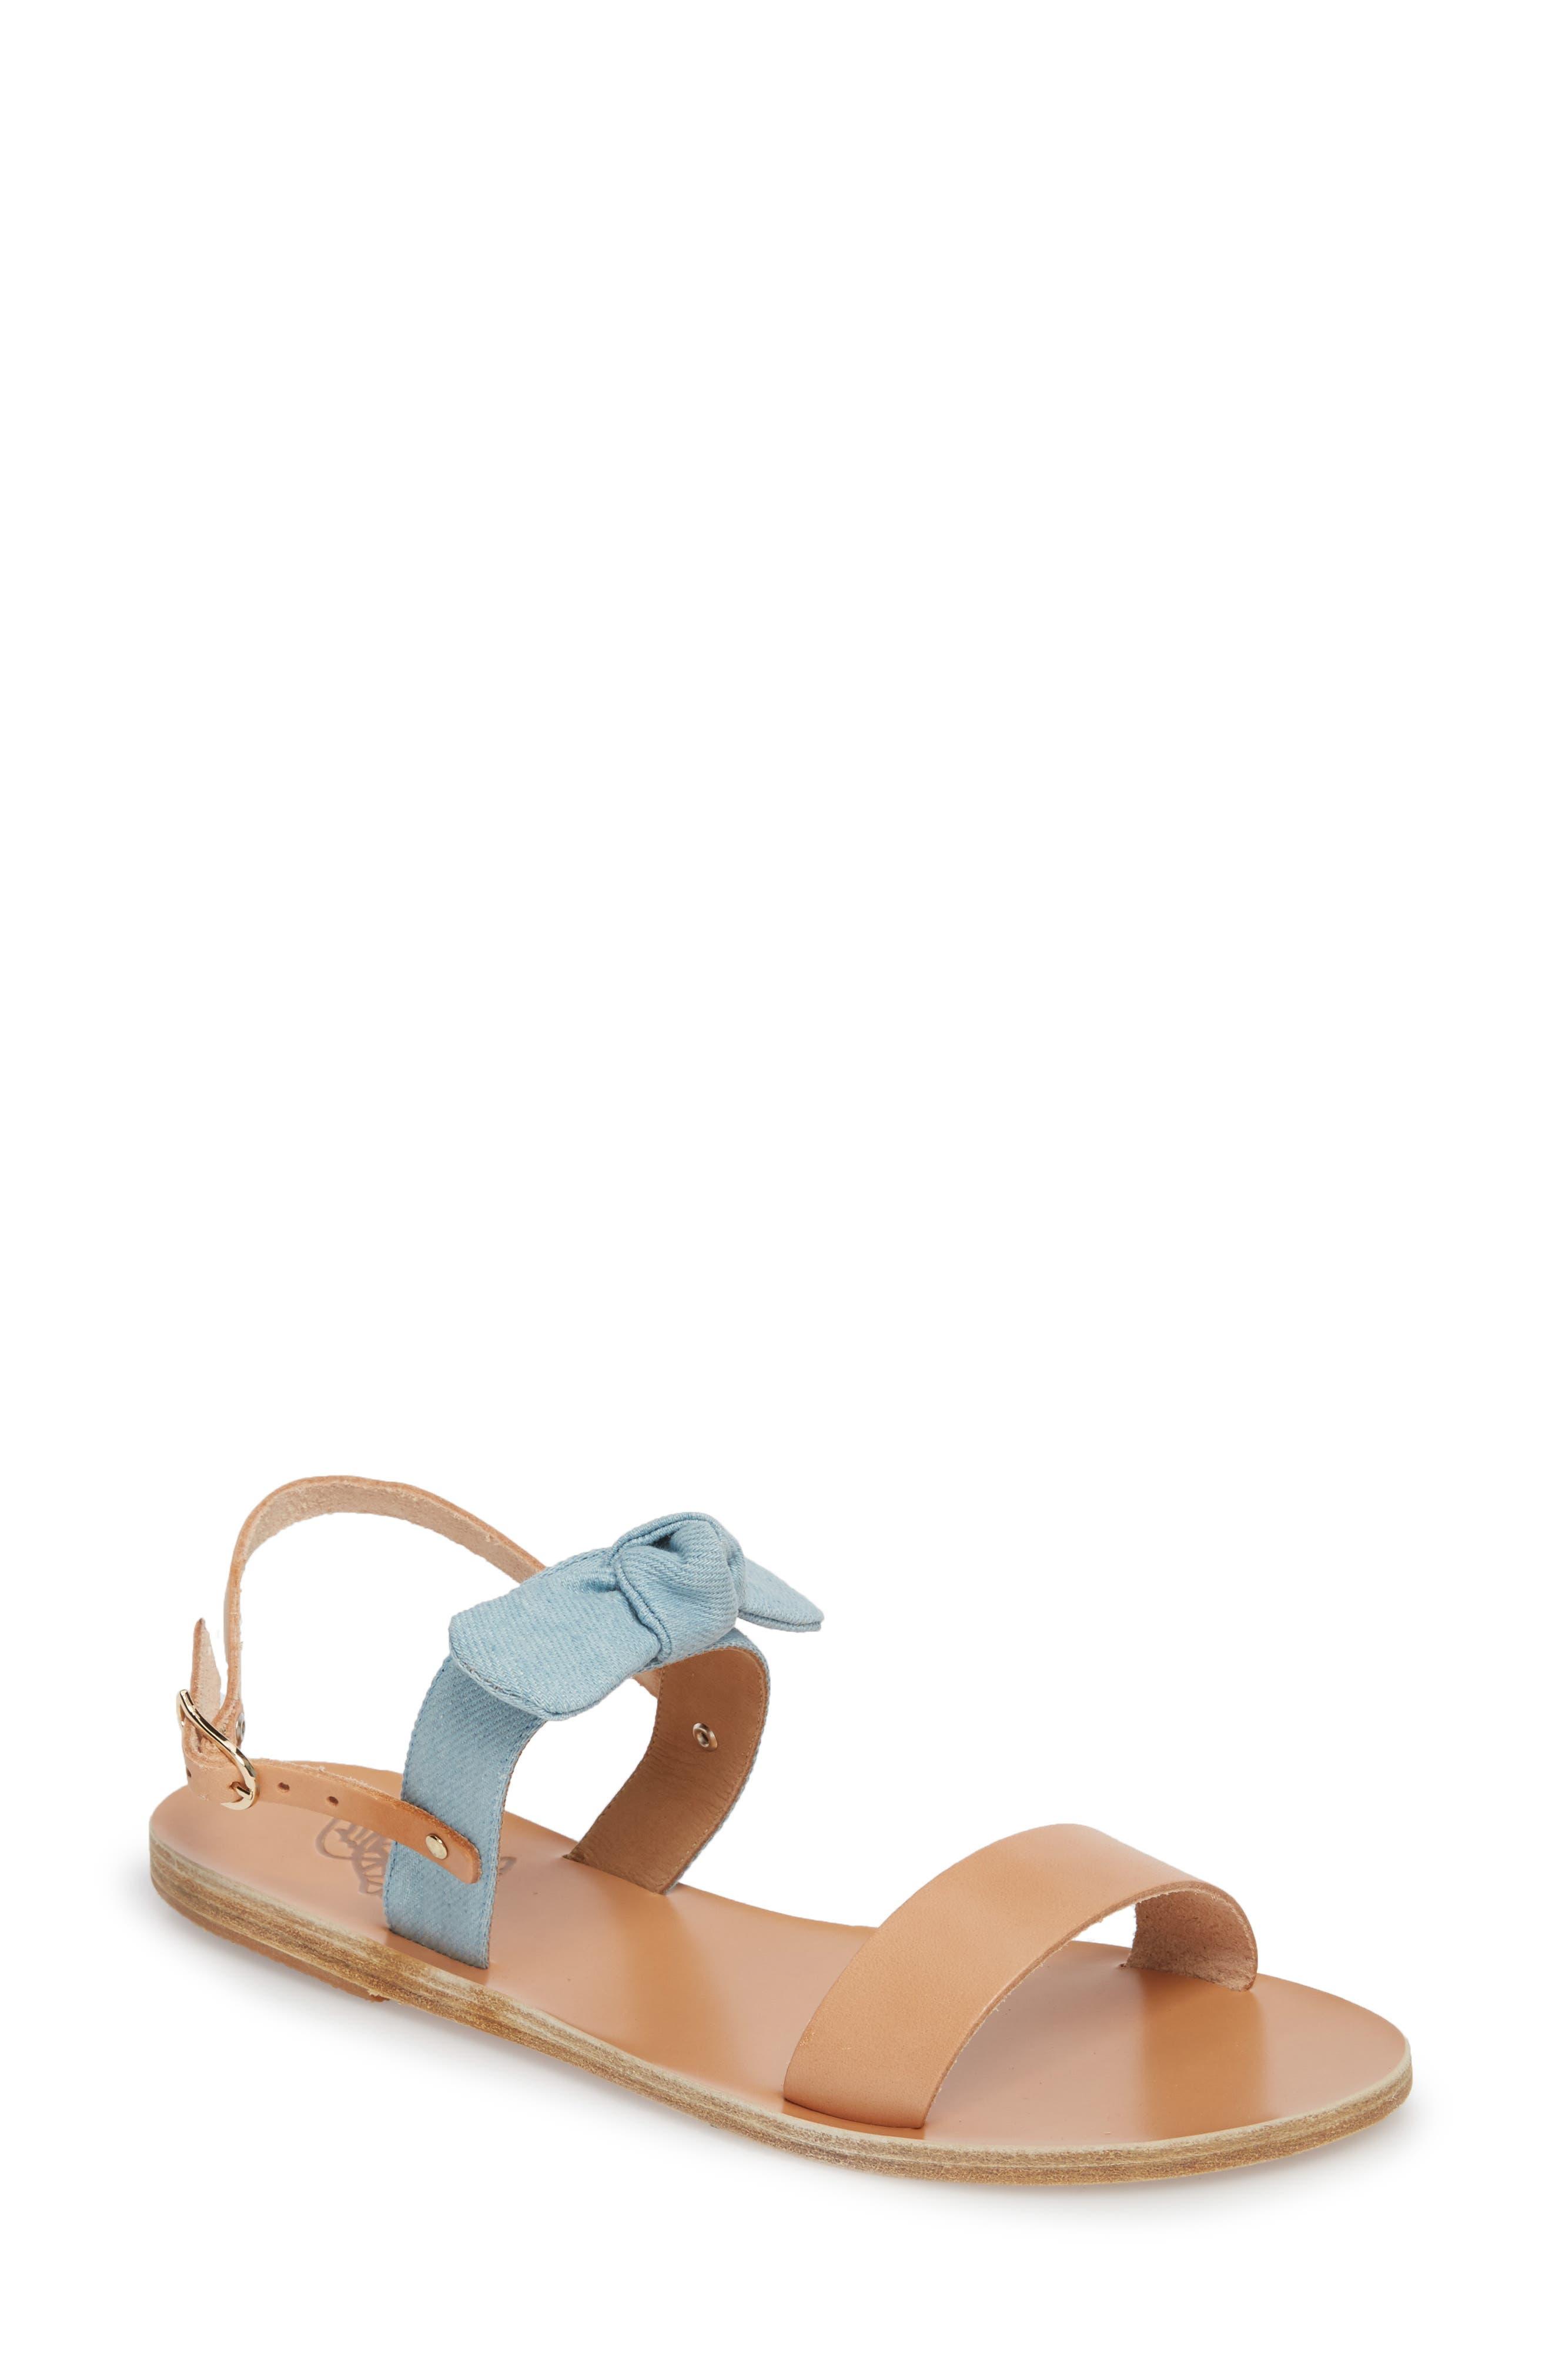 Main Image - Ancient Greek Sandals Clio Bow Sandal (Women)